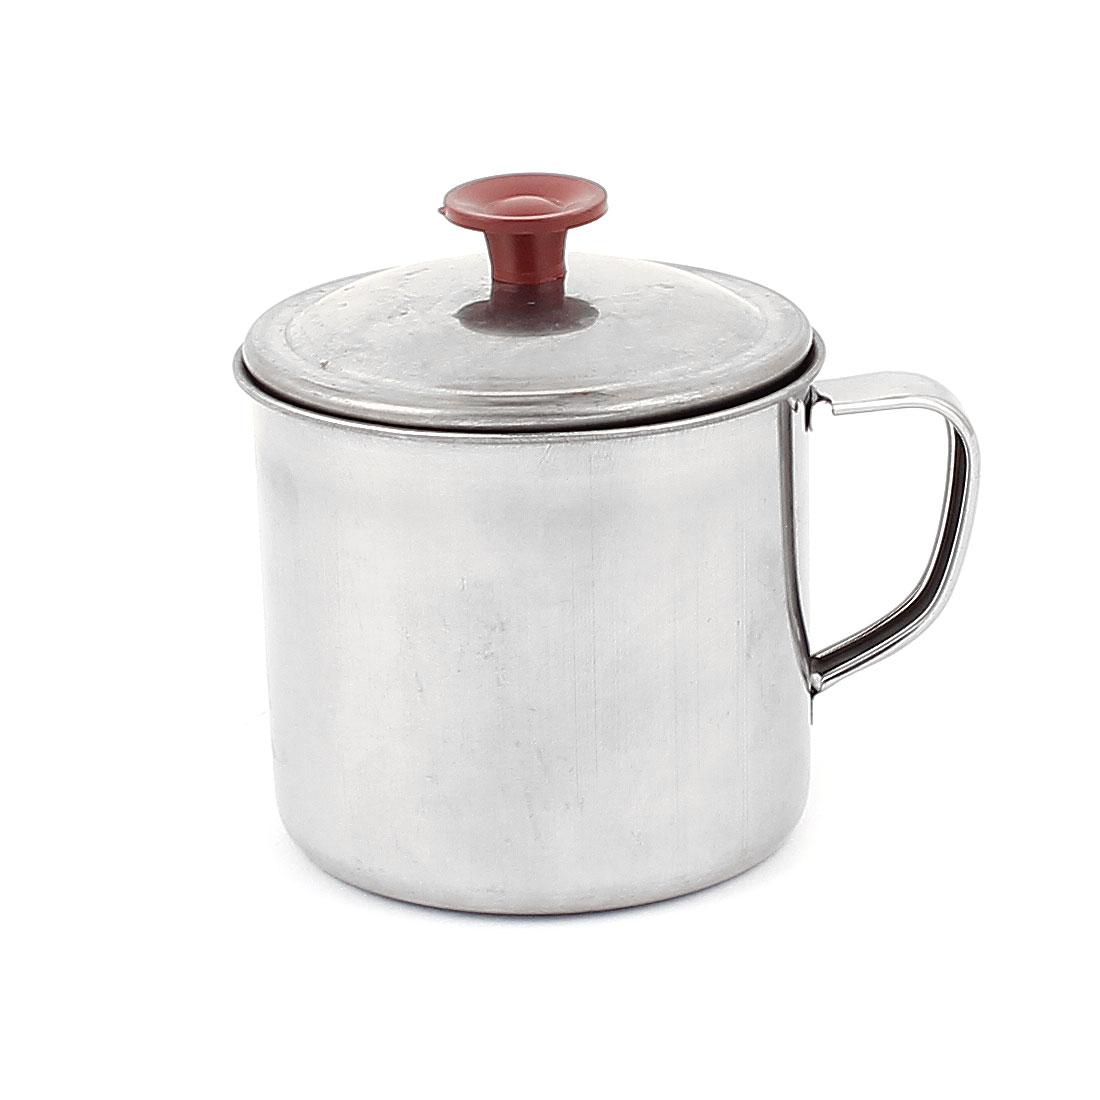 Stainless Steel Handheld Outdoor Camping Drinking Coffee Tea Mug Cup w Lid